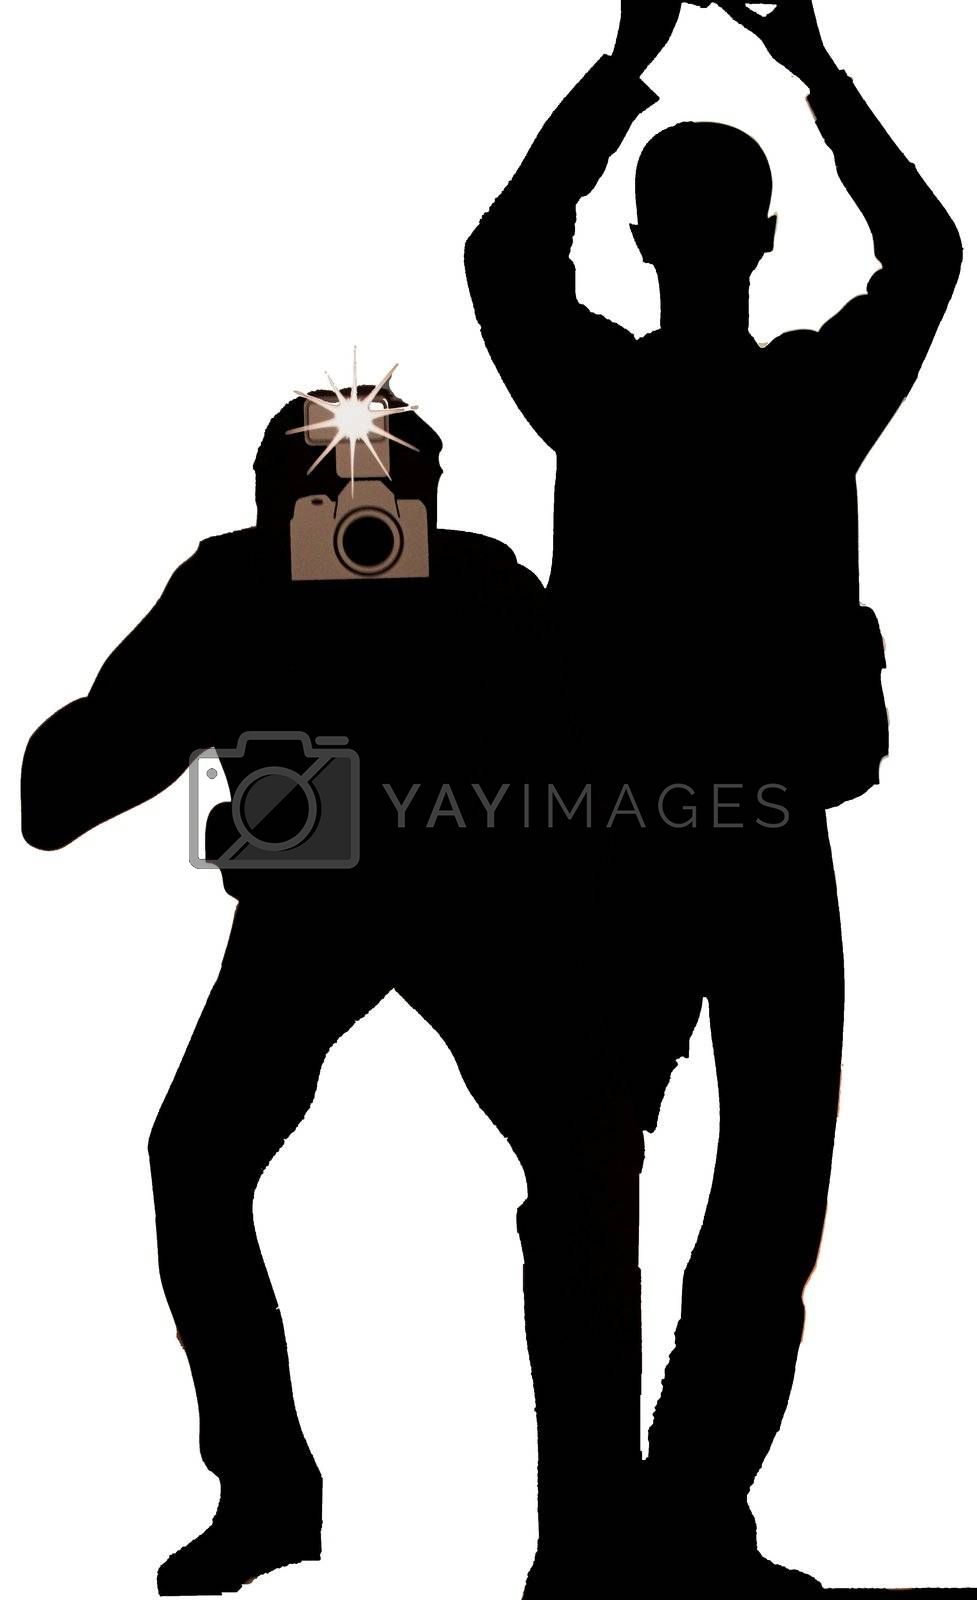 Silhouette of paparazzi photographers